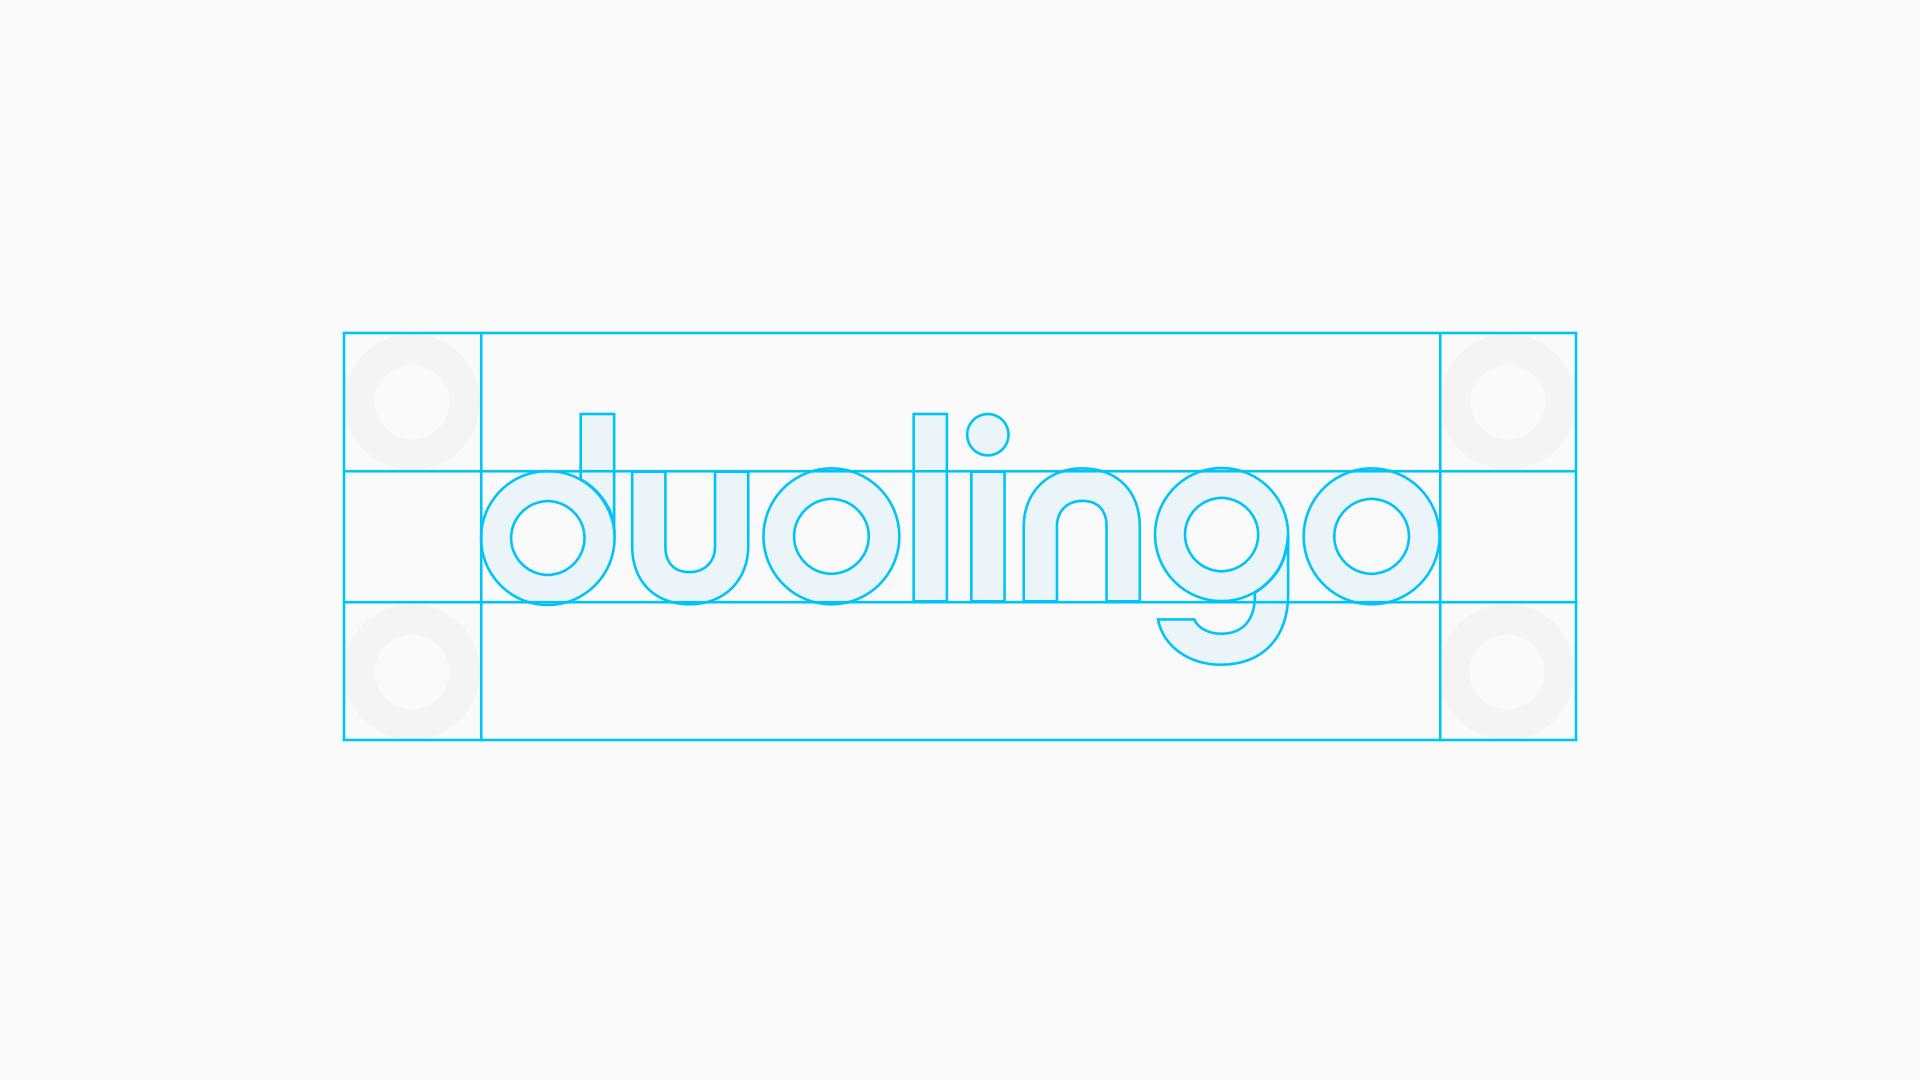 Duolingo Logo Grid